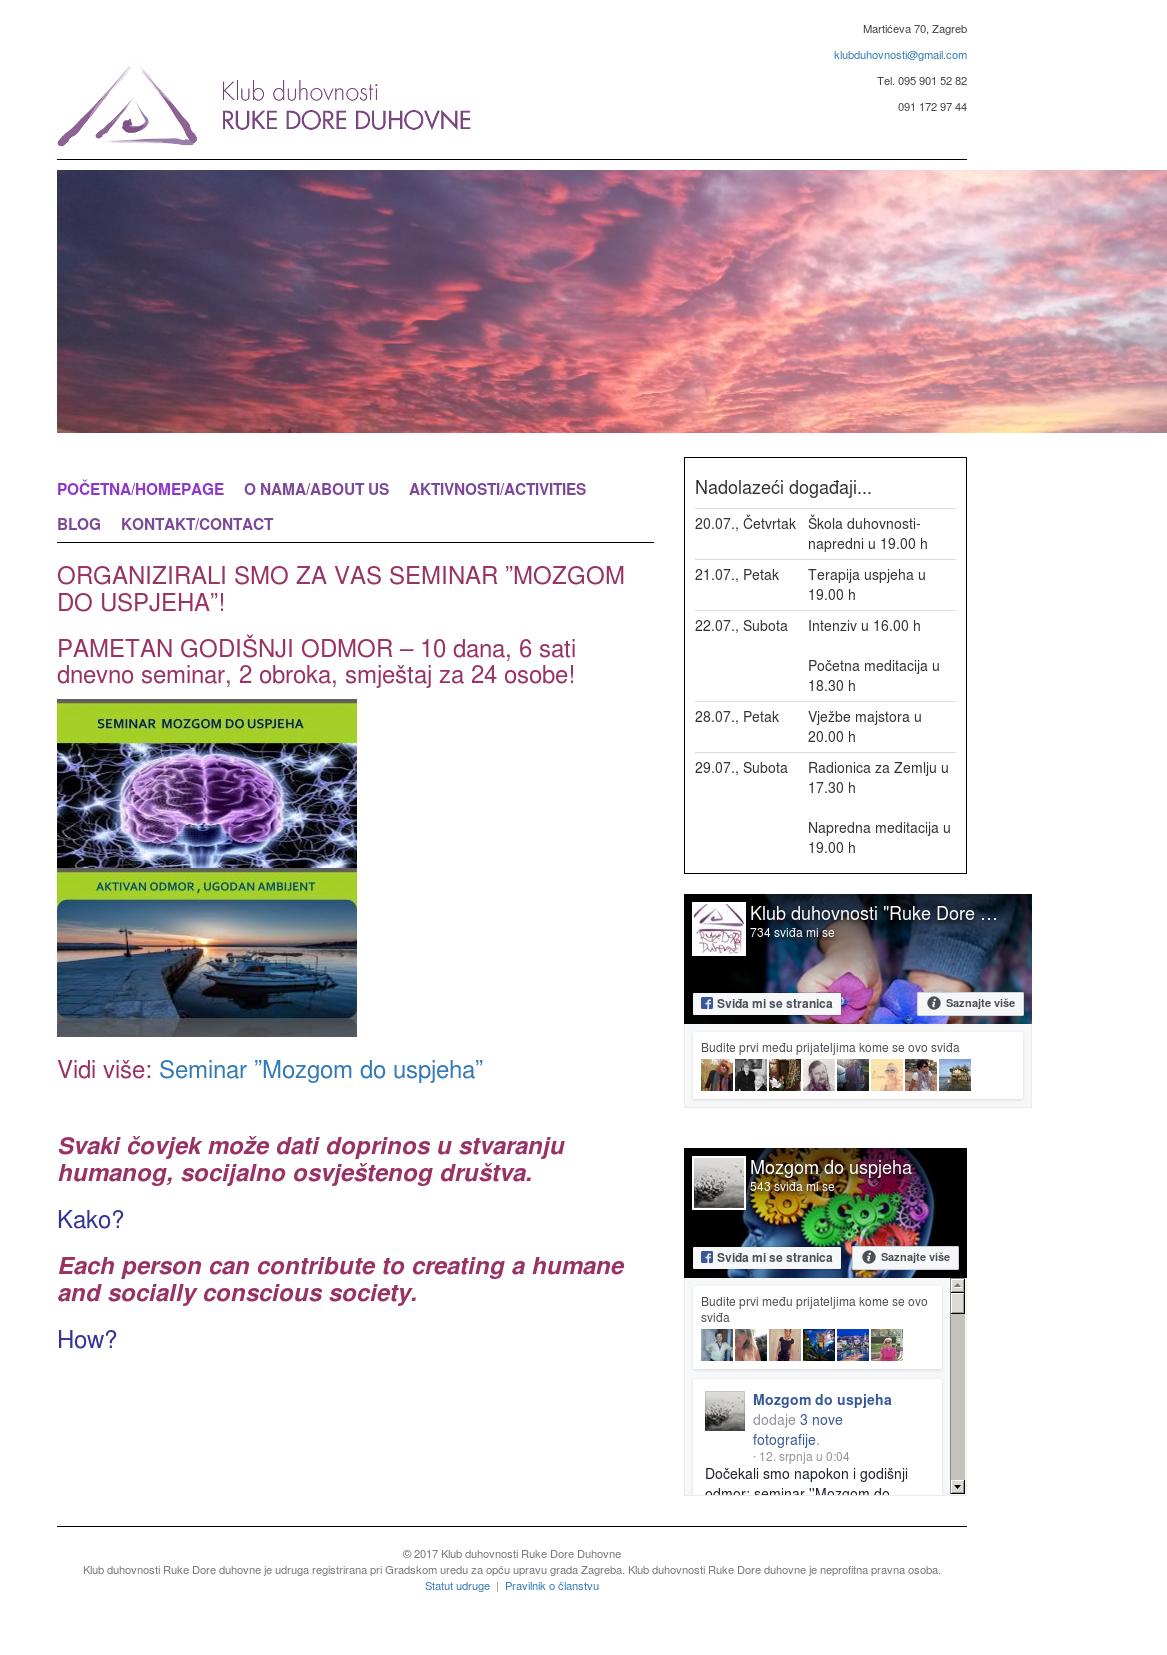 Dating web stranice duhovni uk